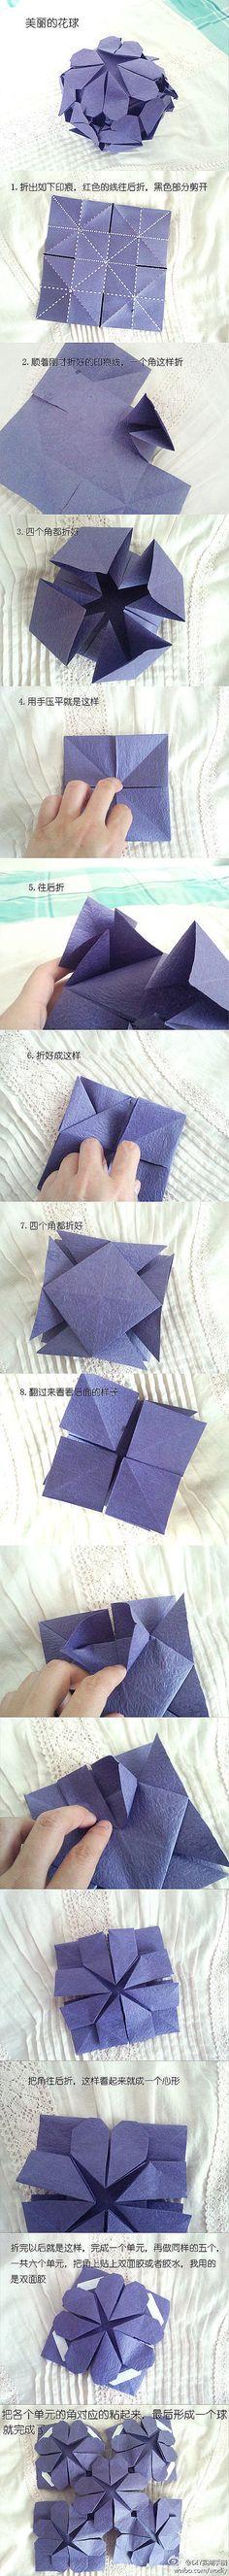 24 ideas for origami modular ball Origami Modular, Origami Paper Folding, Origami And Quilling, Origami And Kirigami, Origami Ball, Paper Crafts Origami, Oragami, Heart Origami, Useful Origami